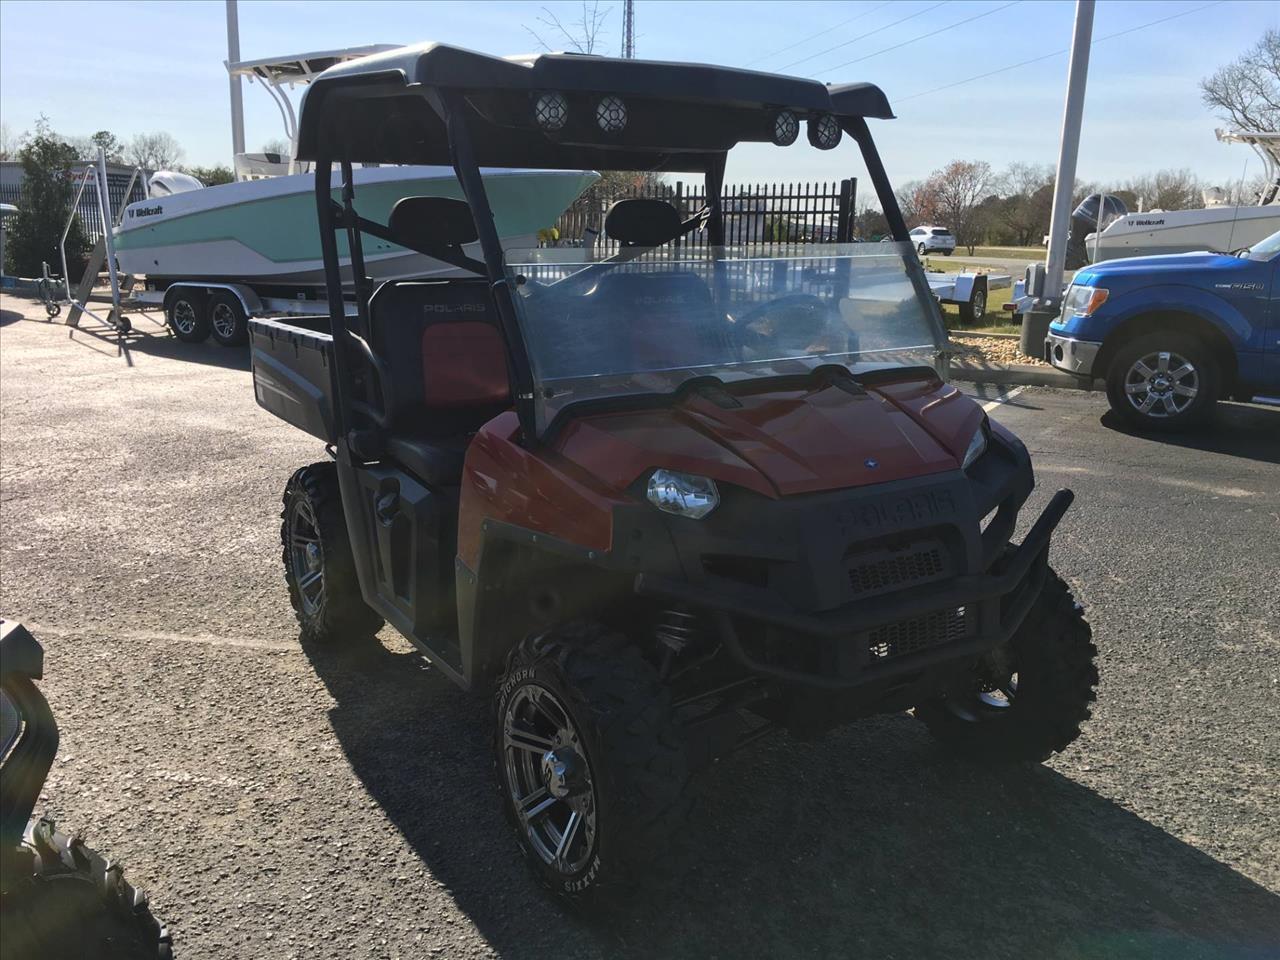 2010 Polaris Ranger 800 EFI XP® EPS for sale at Vehicle Network, LLC - Performance East, INC. in Goldsboro NC